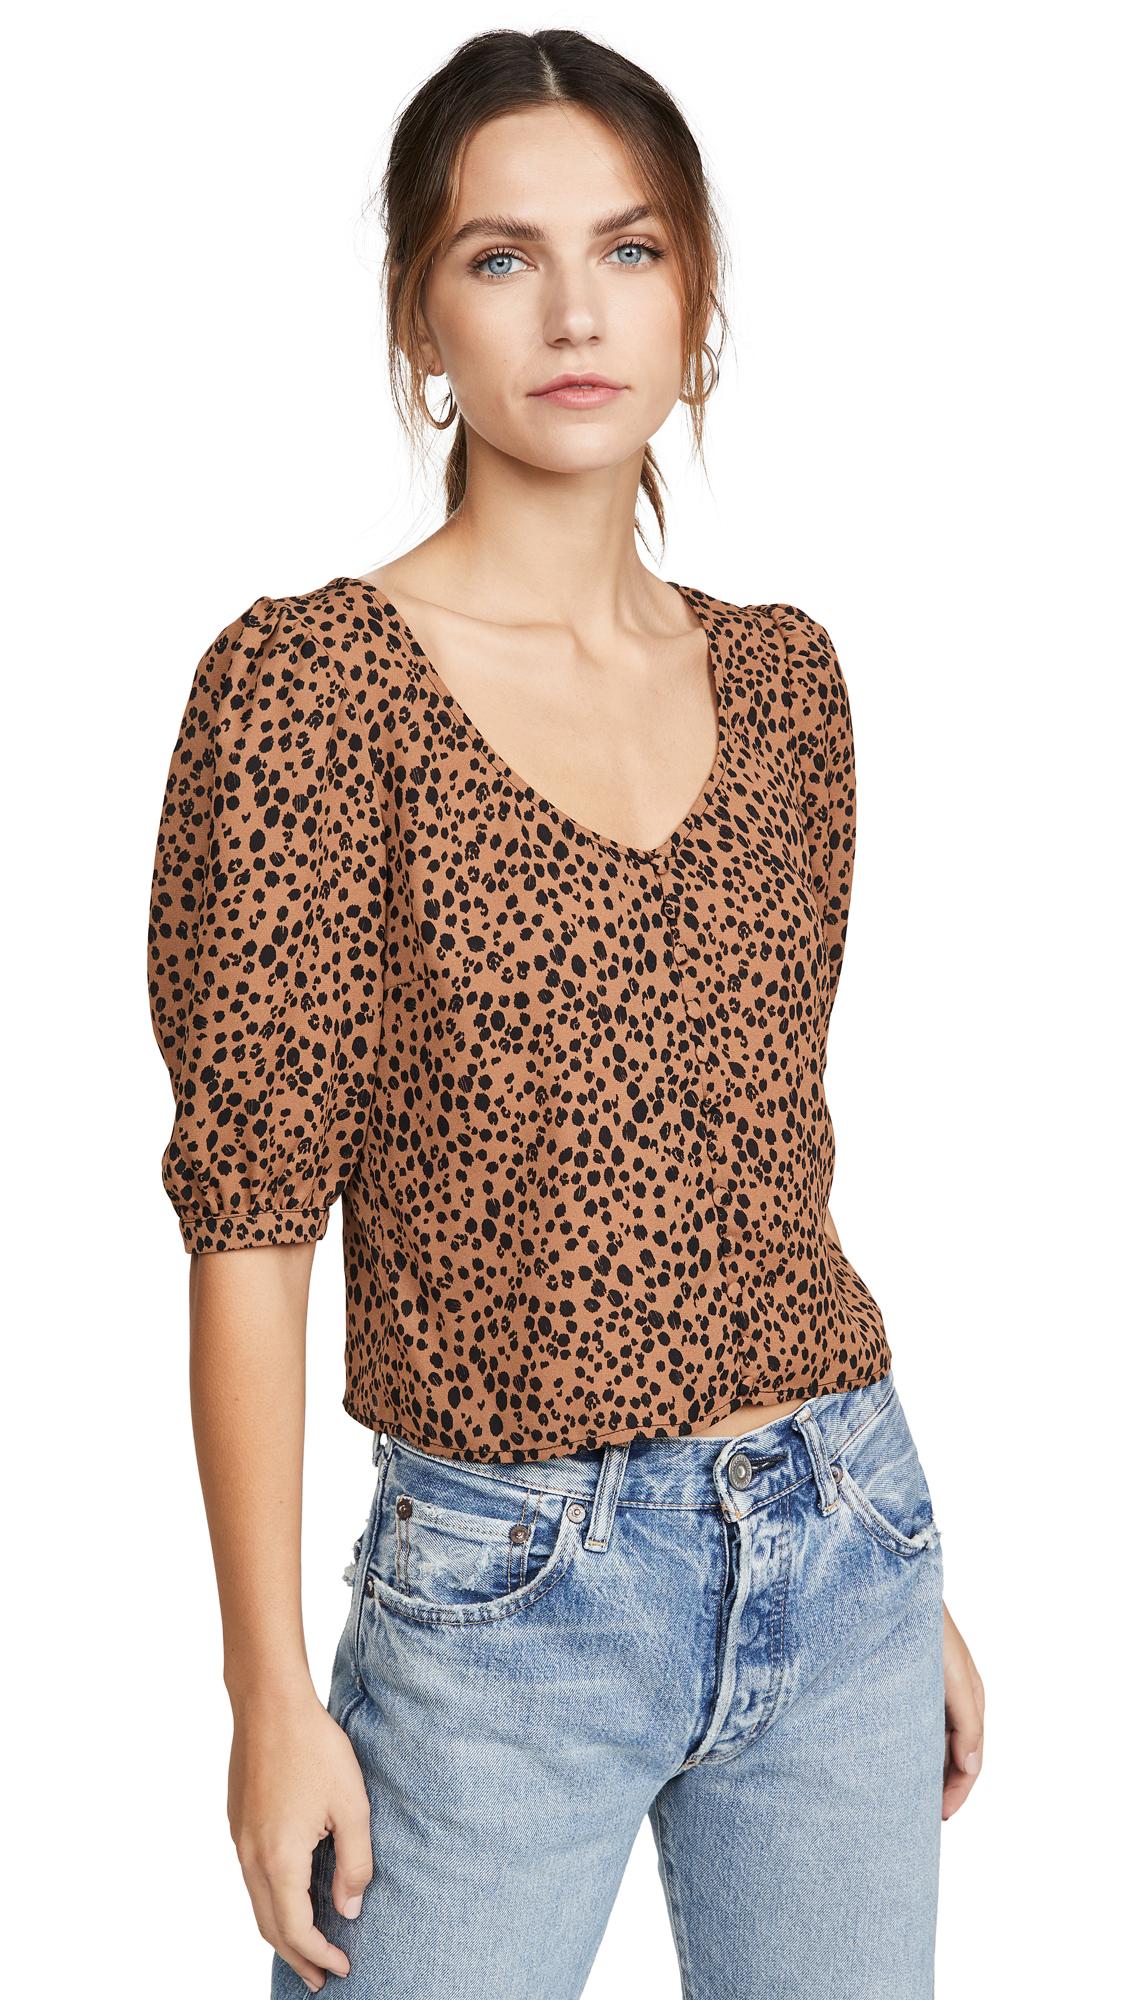 BB Dakota Cheetah Print Puff Sleeve Top - 60% Off Sale